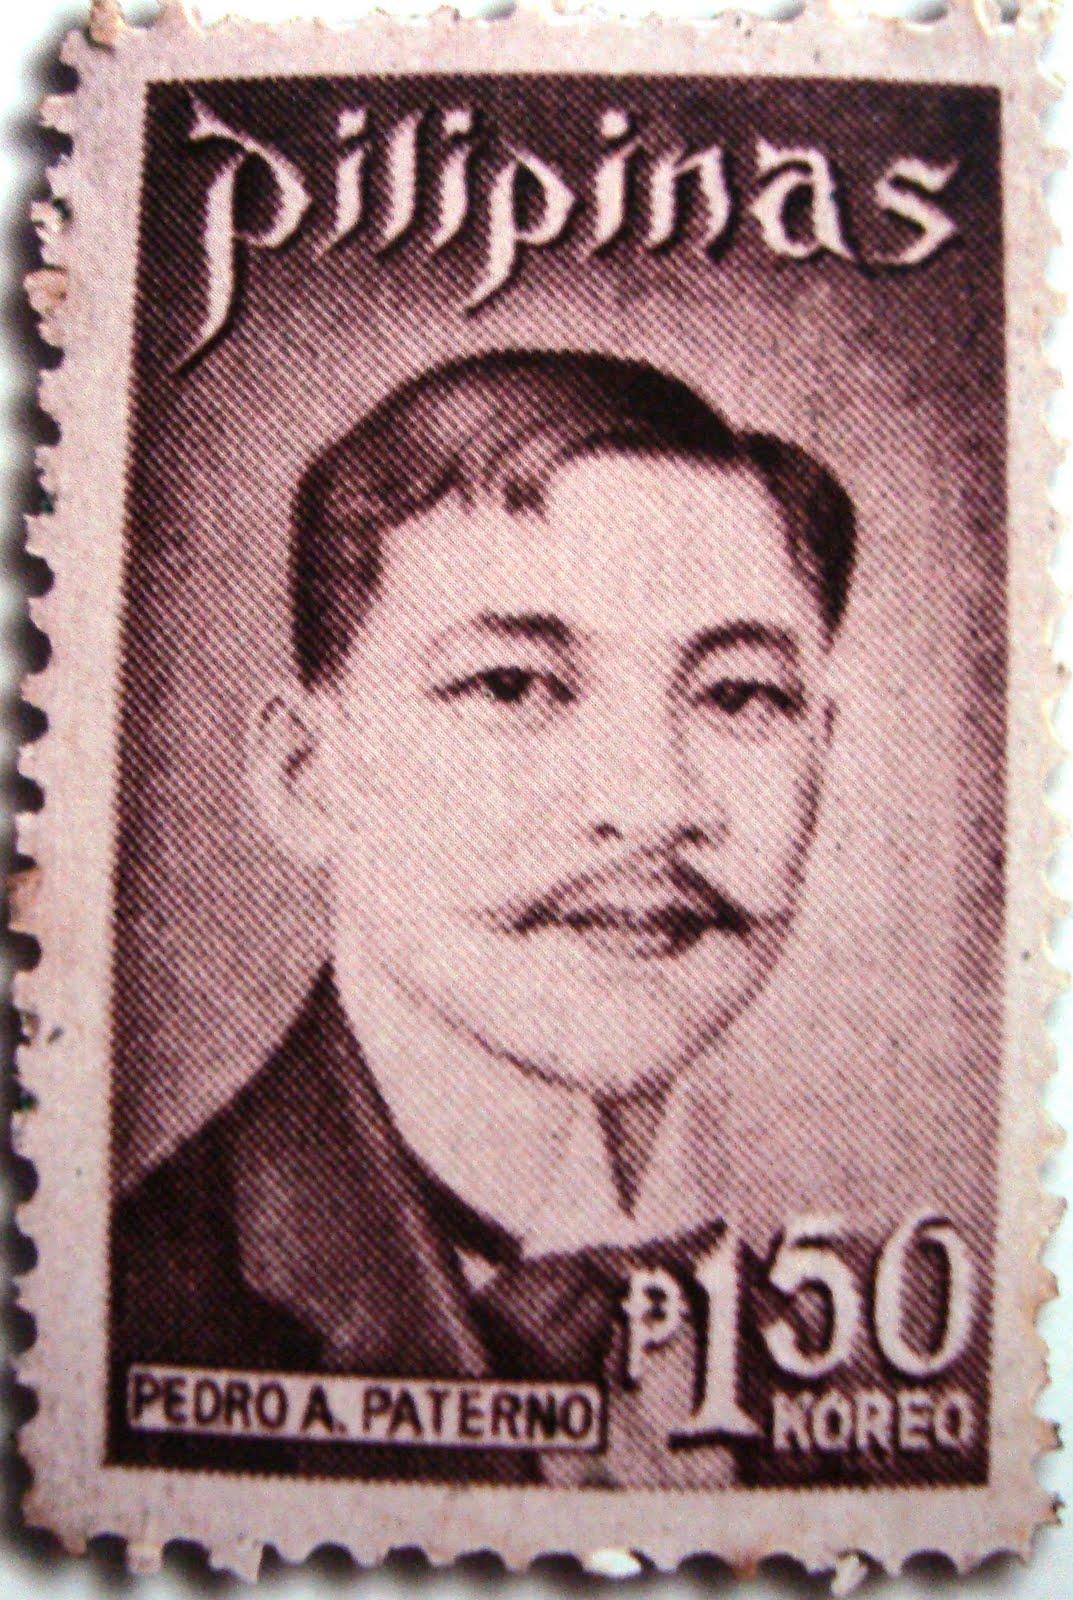 sampaguitas y poesias Sampaguita y poesias by pedro paterno pedro a paterno (1858-1911) proponent  of the pact of biak-na-bato pedro alejandro paterno was born in santa cruz,.